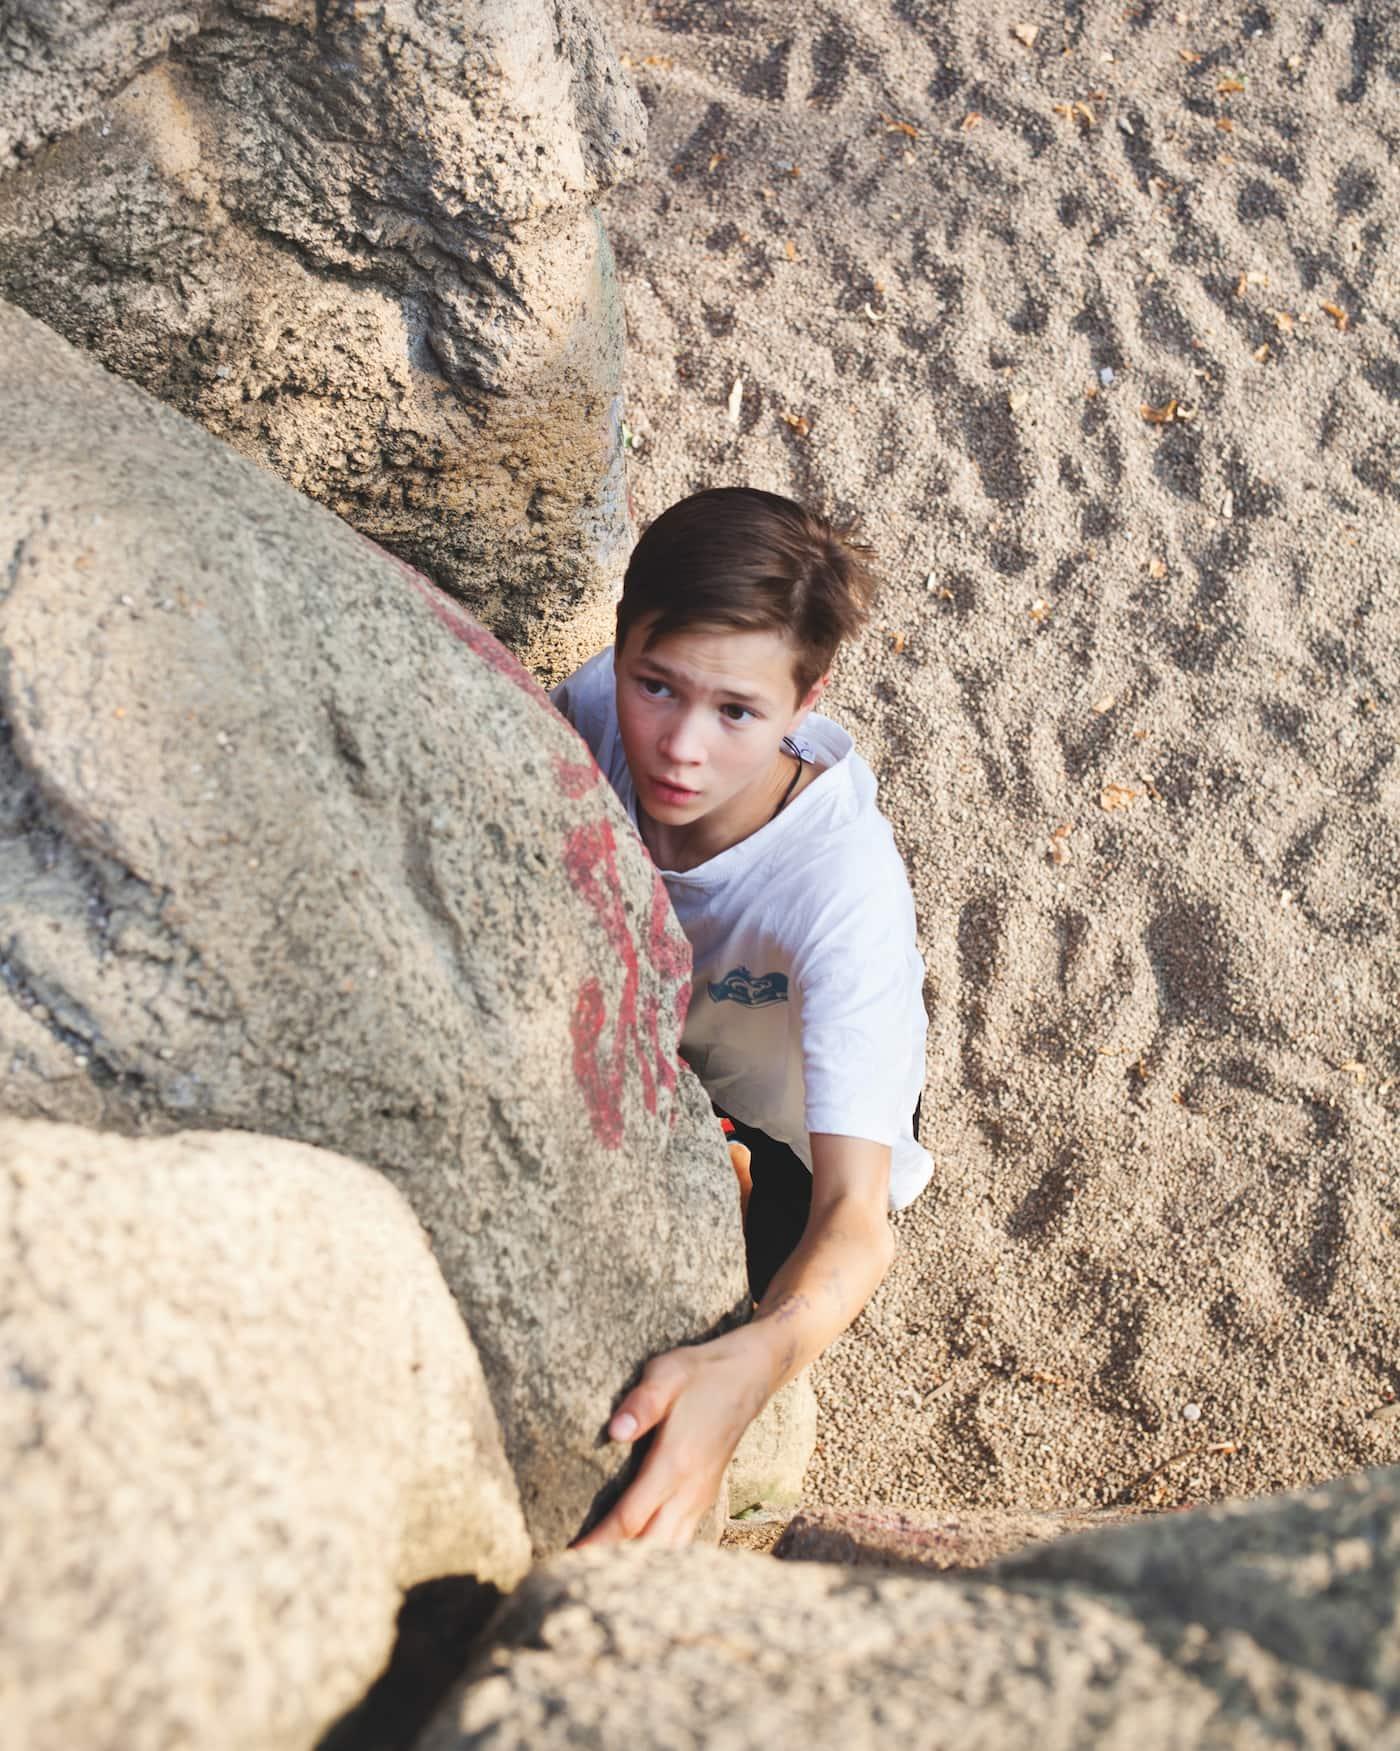 Kindersport in Berlin: Klettern und Bouldern // HIMBEER